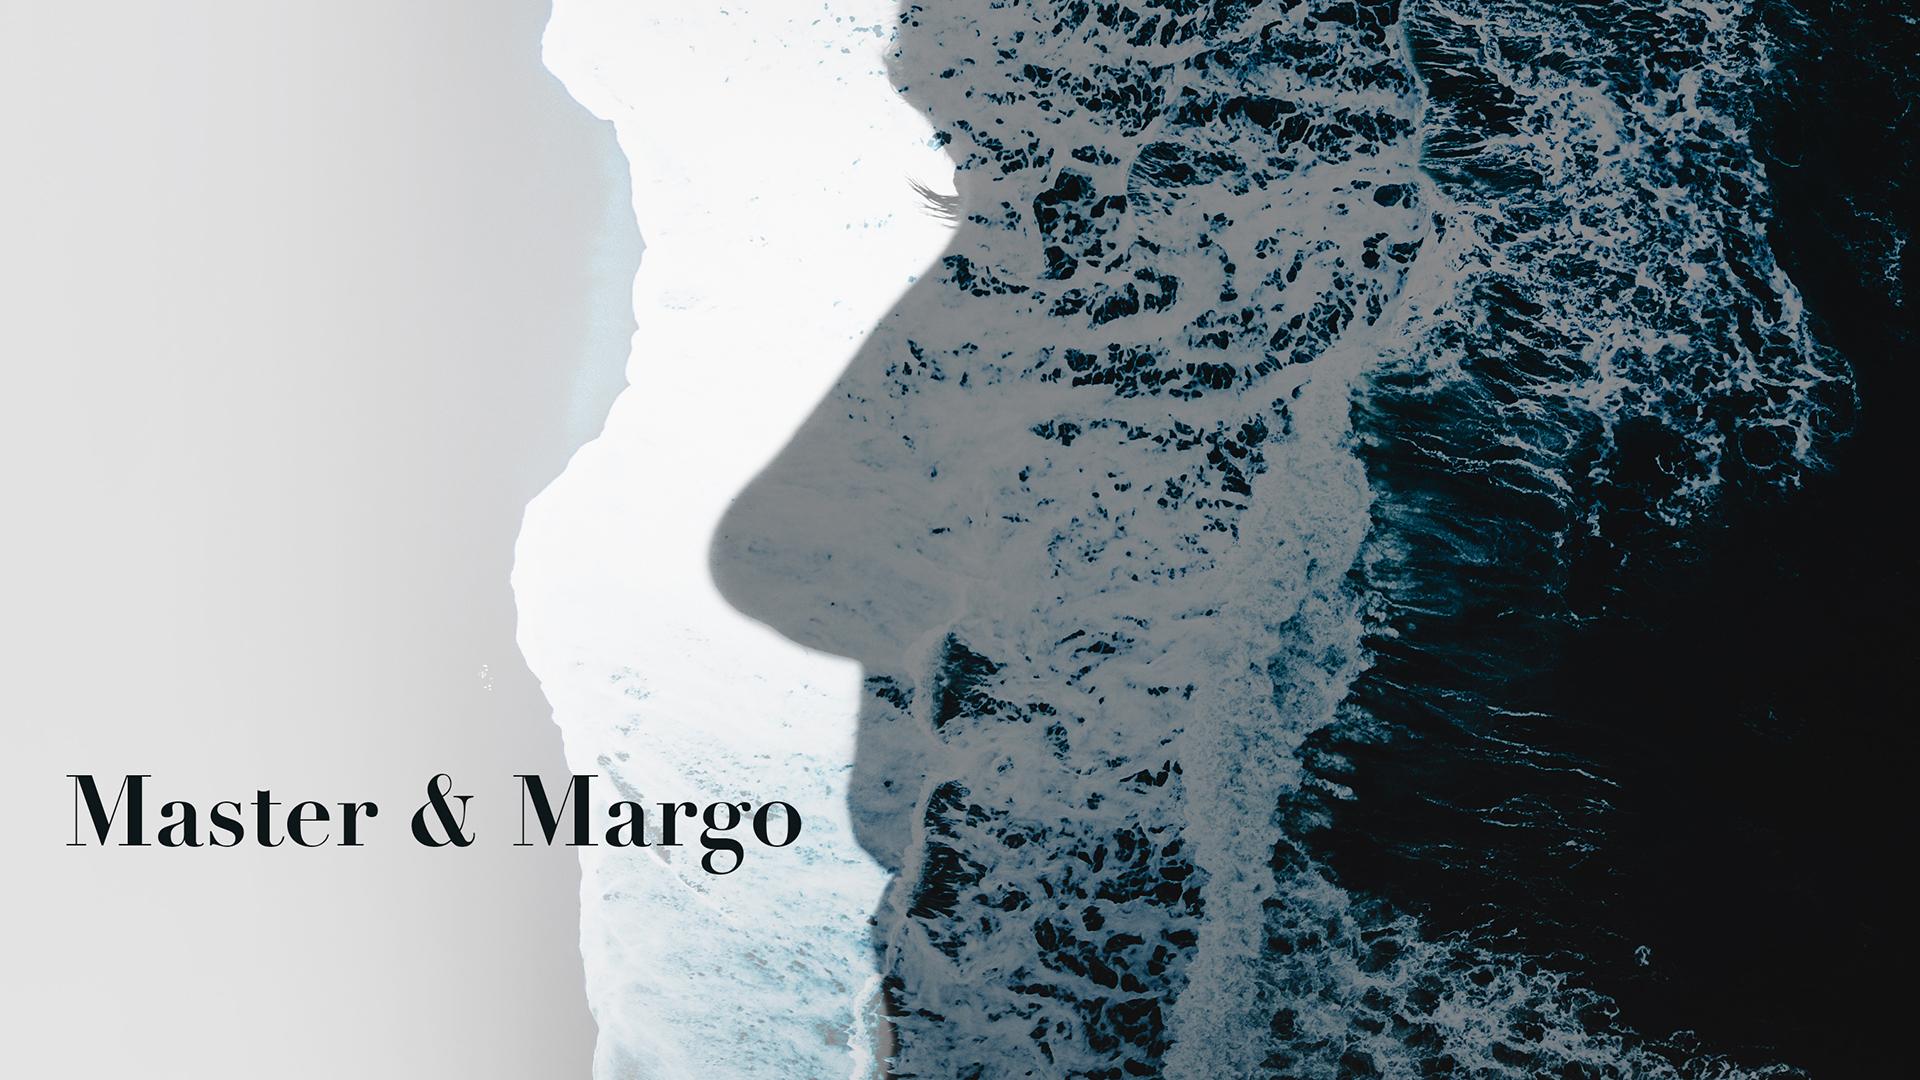 Master & Margo